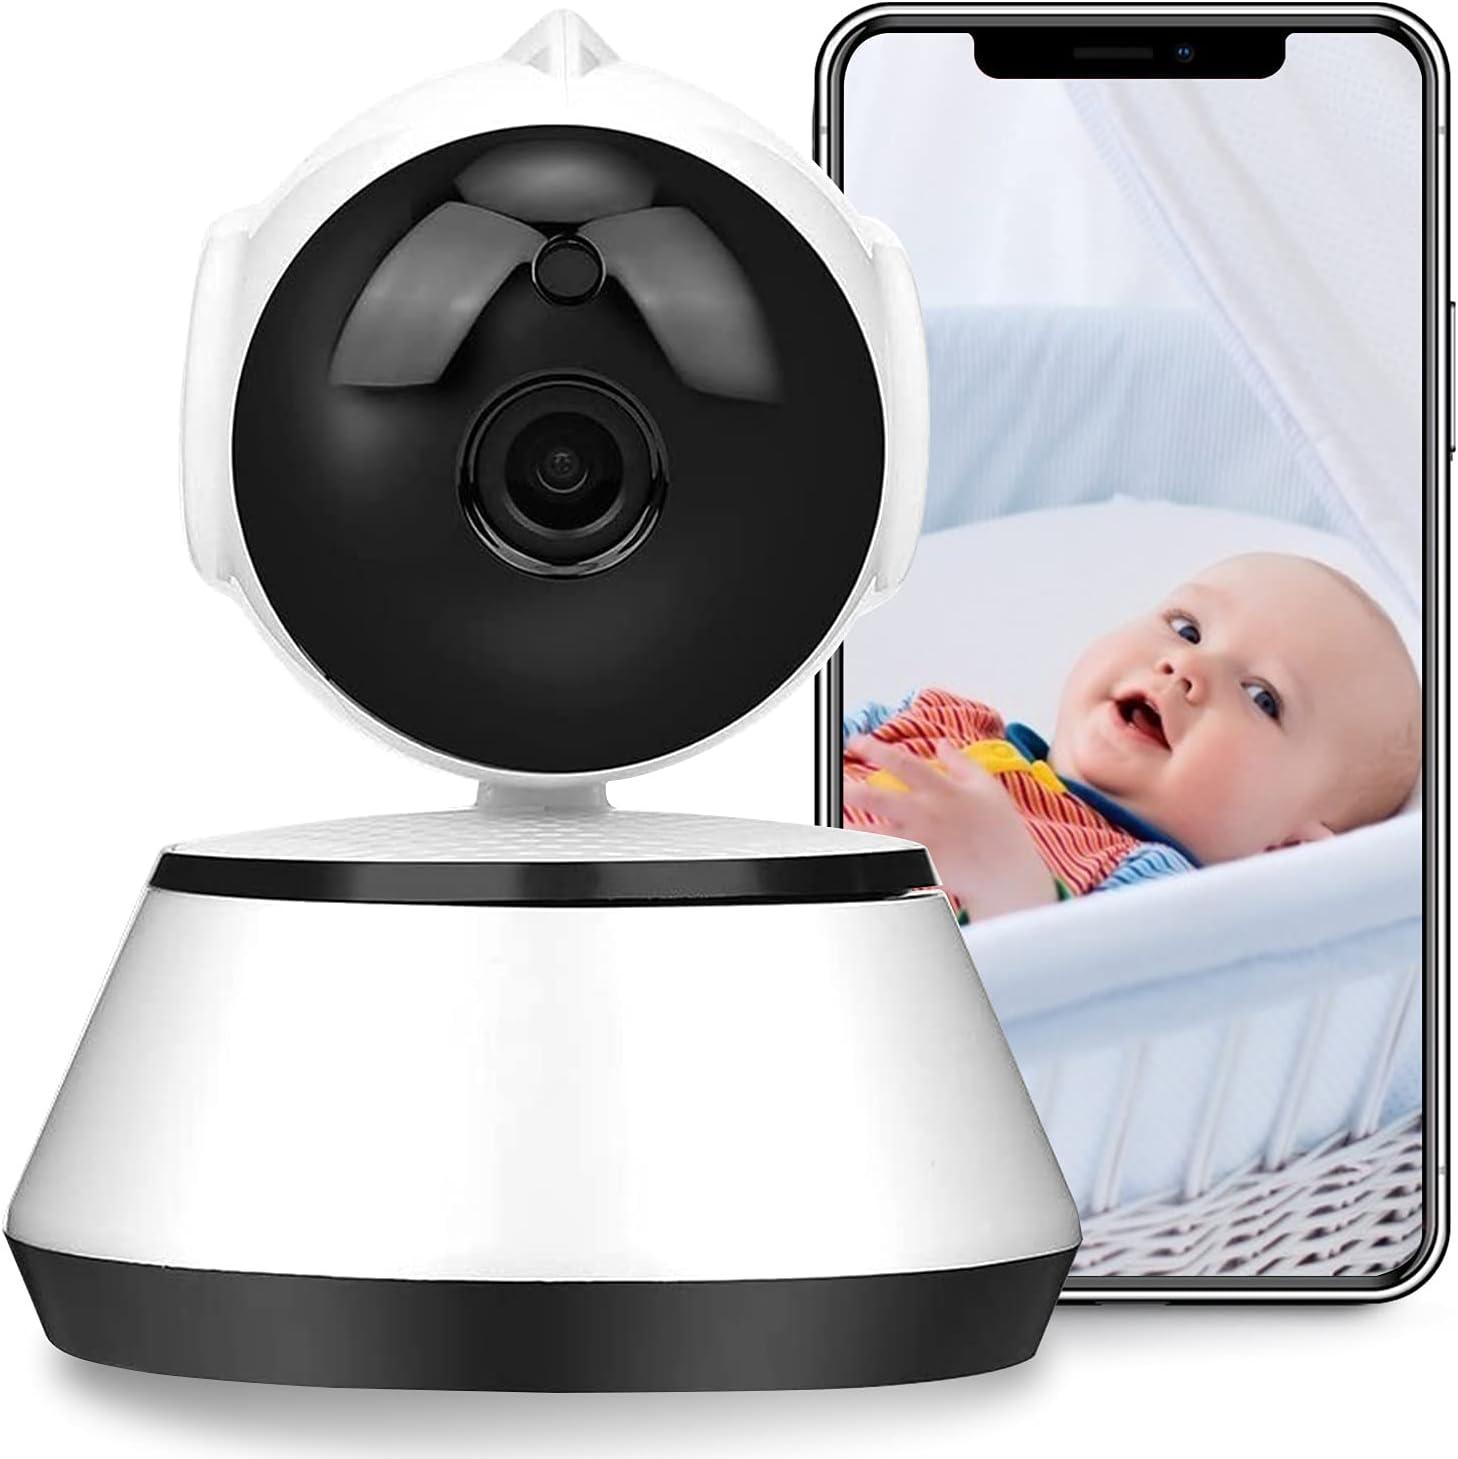 Qing niao Wireless Baby Monitor Security Camera Two Way Intercom Baby Monitor 110-240V